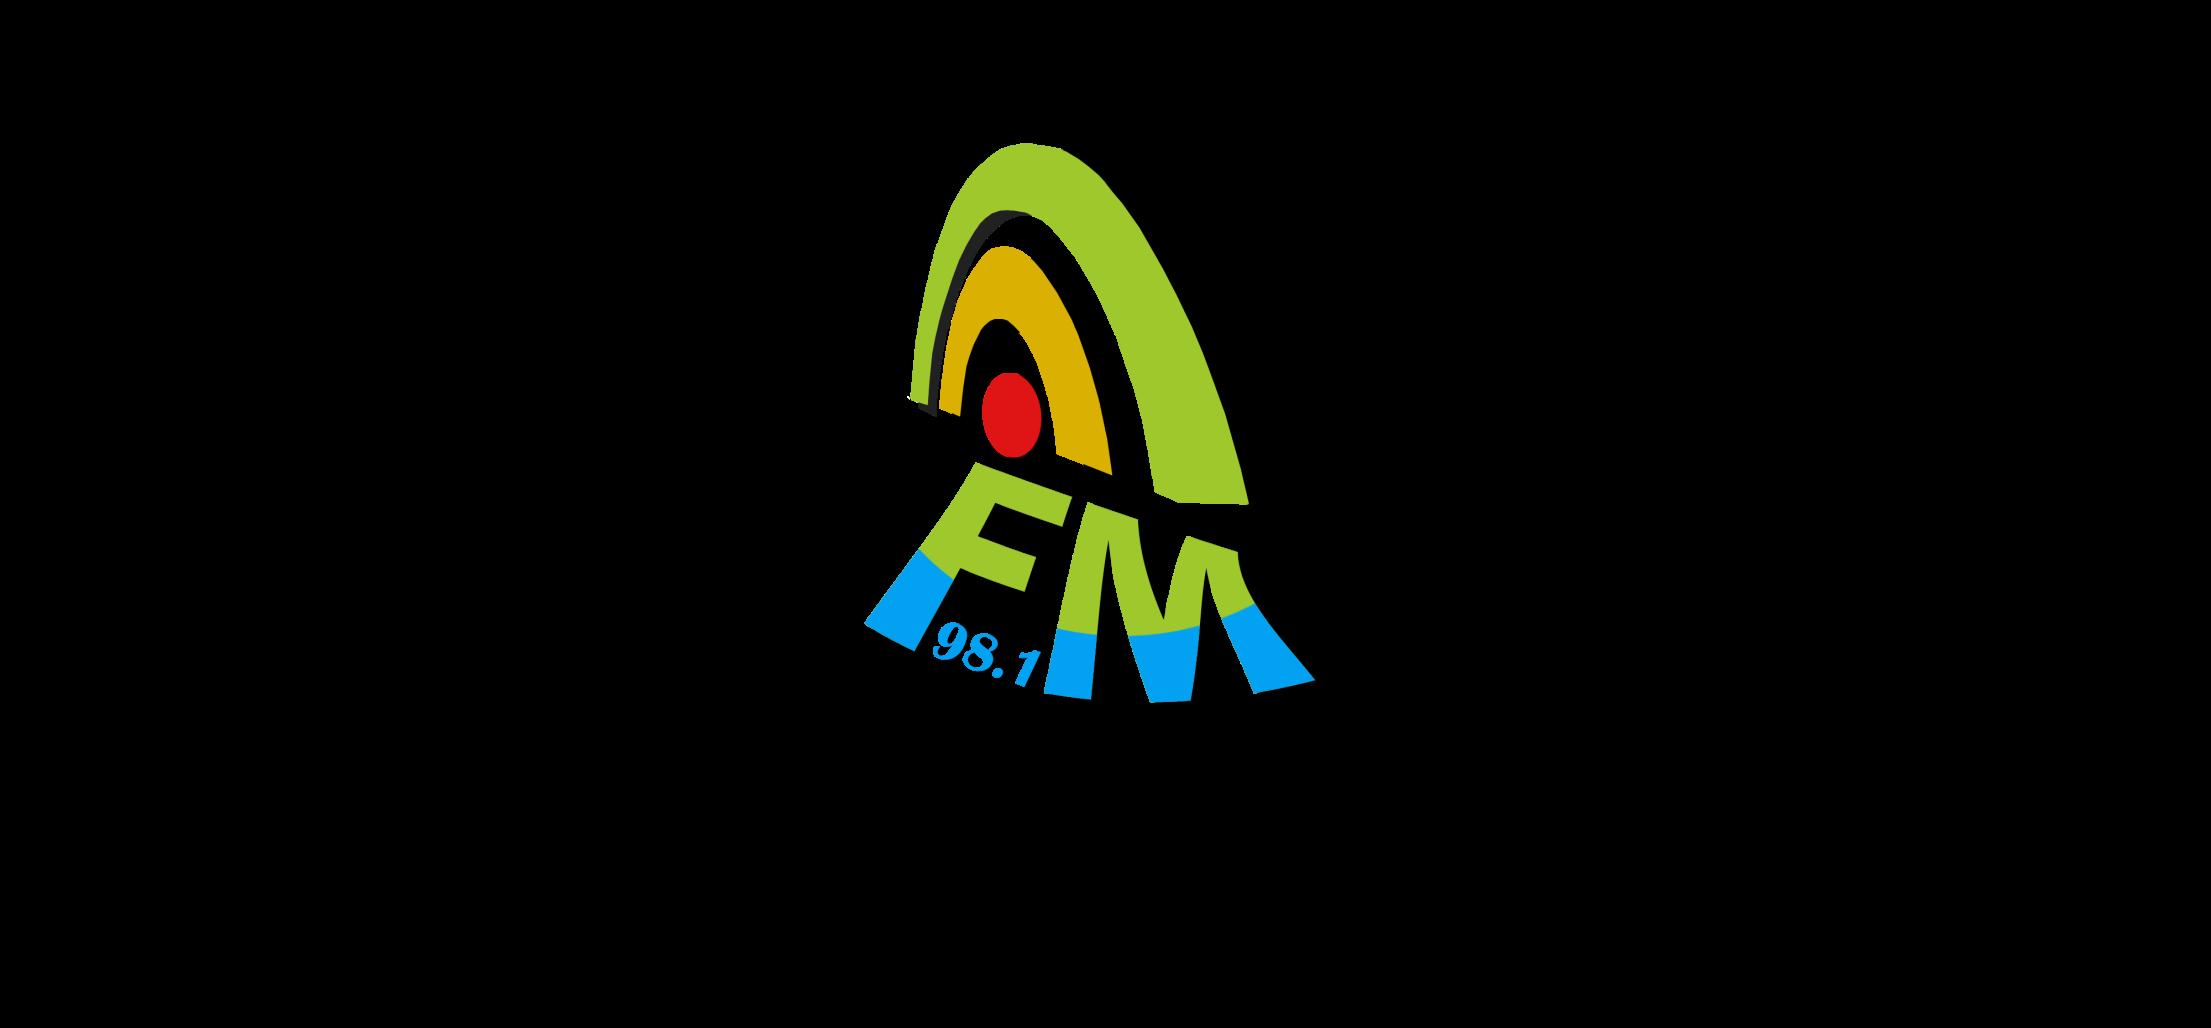 Nfm. News clipart radio presenter